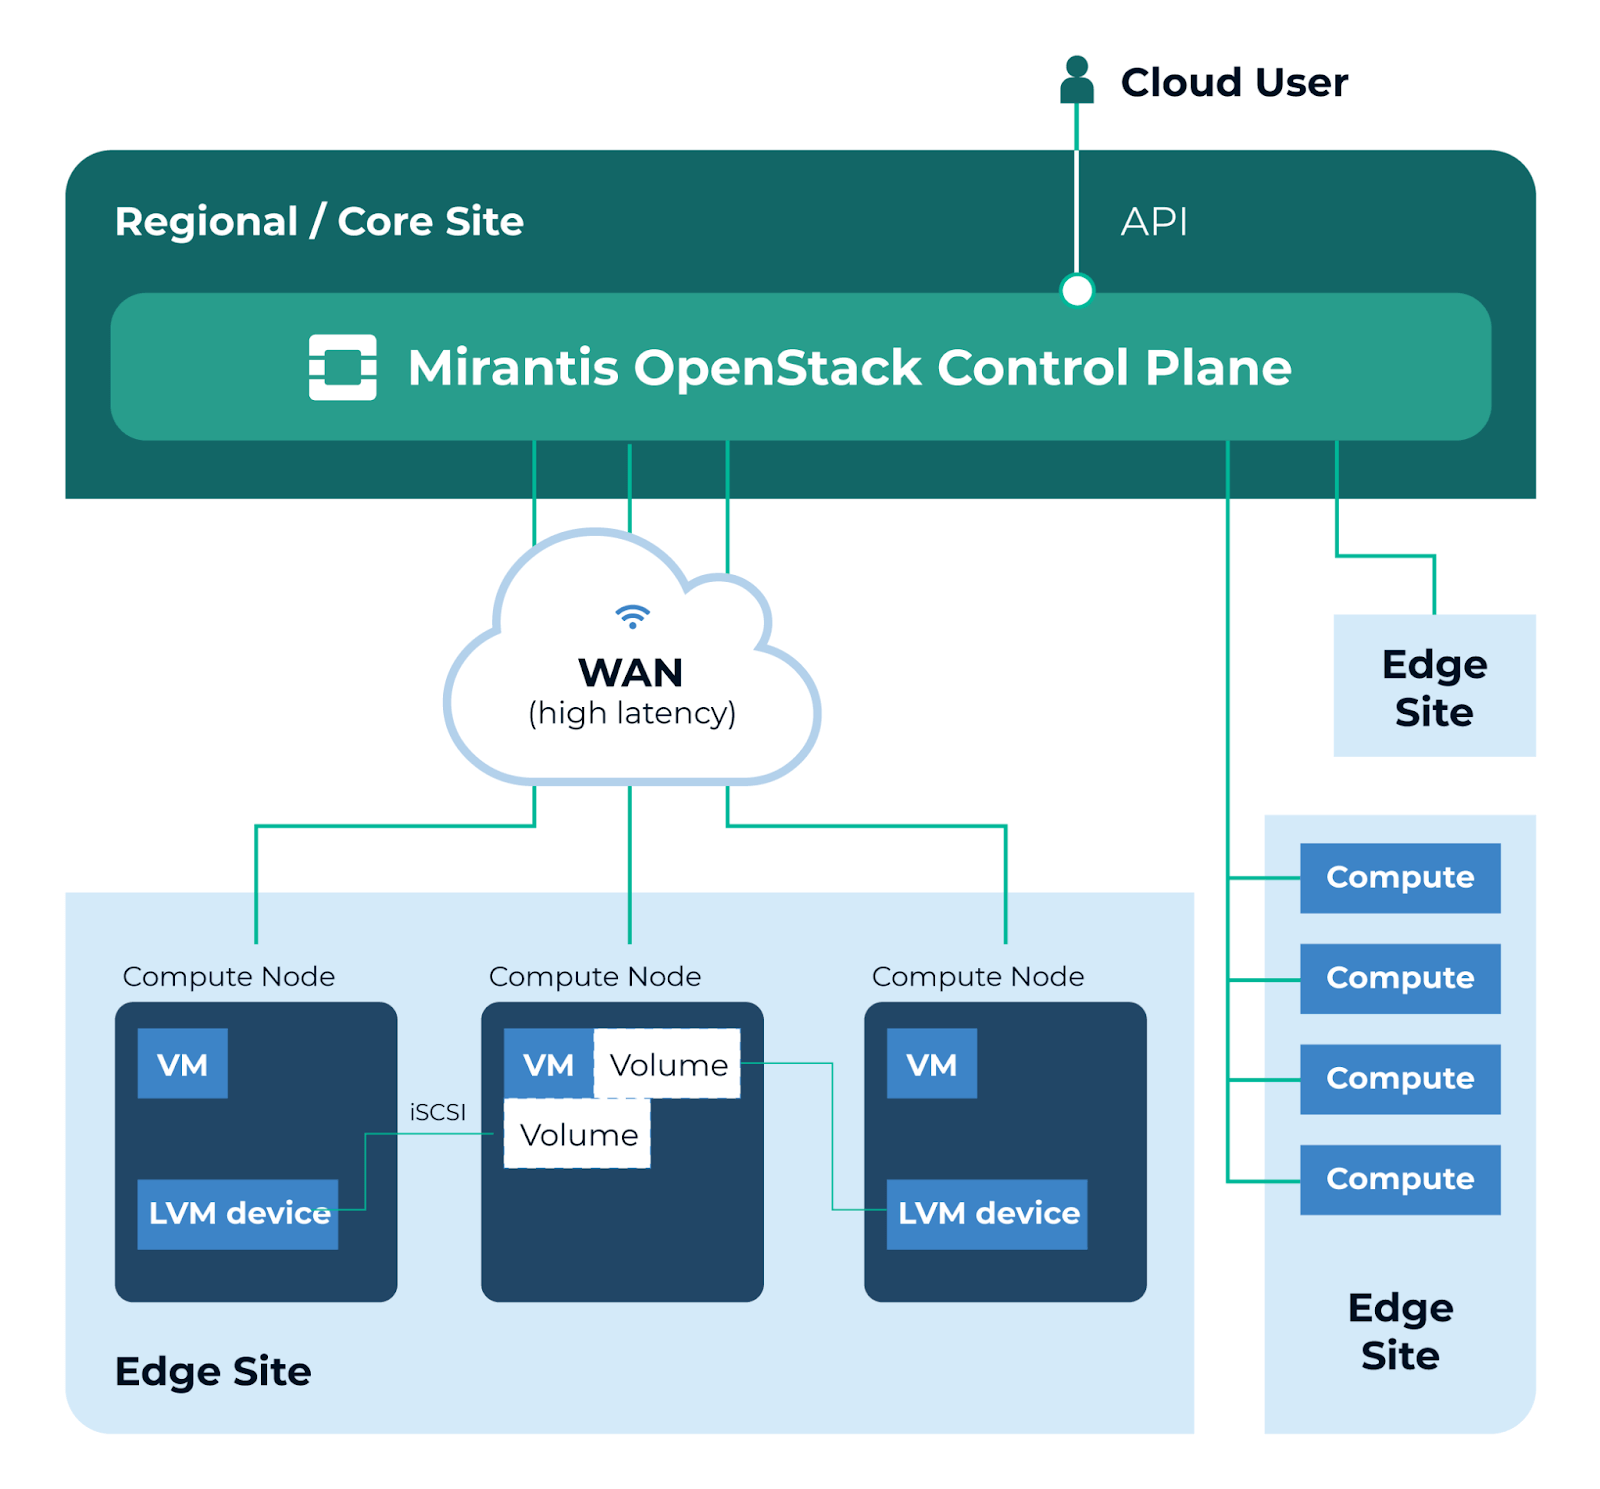 Mirantis OpenStack Control Plane